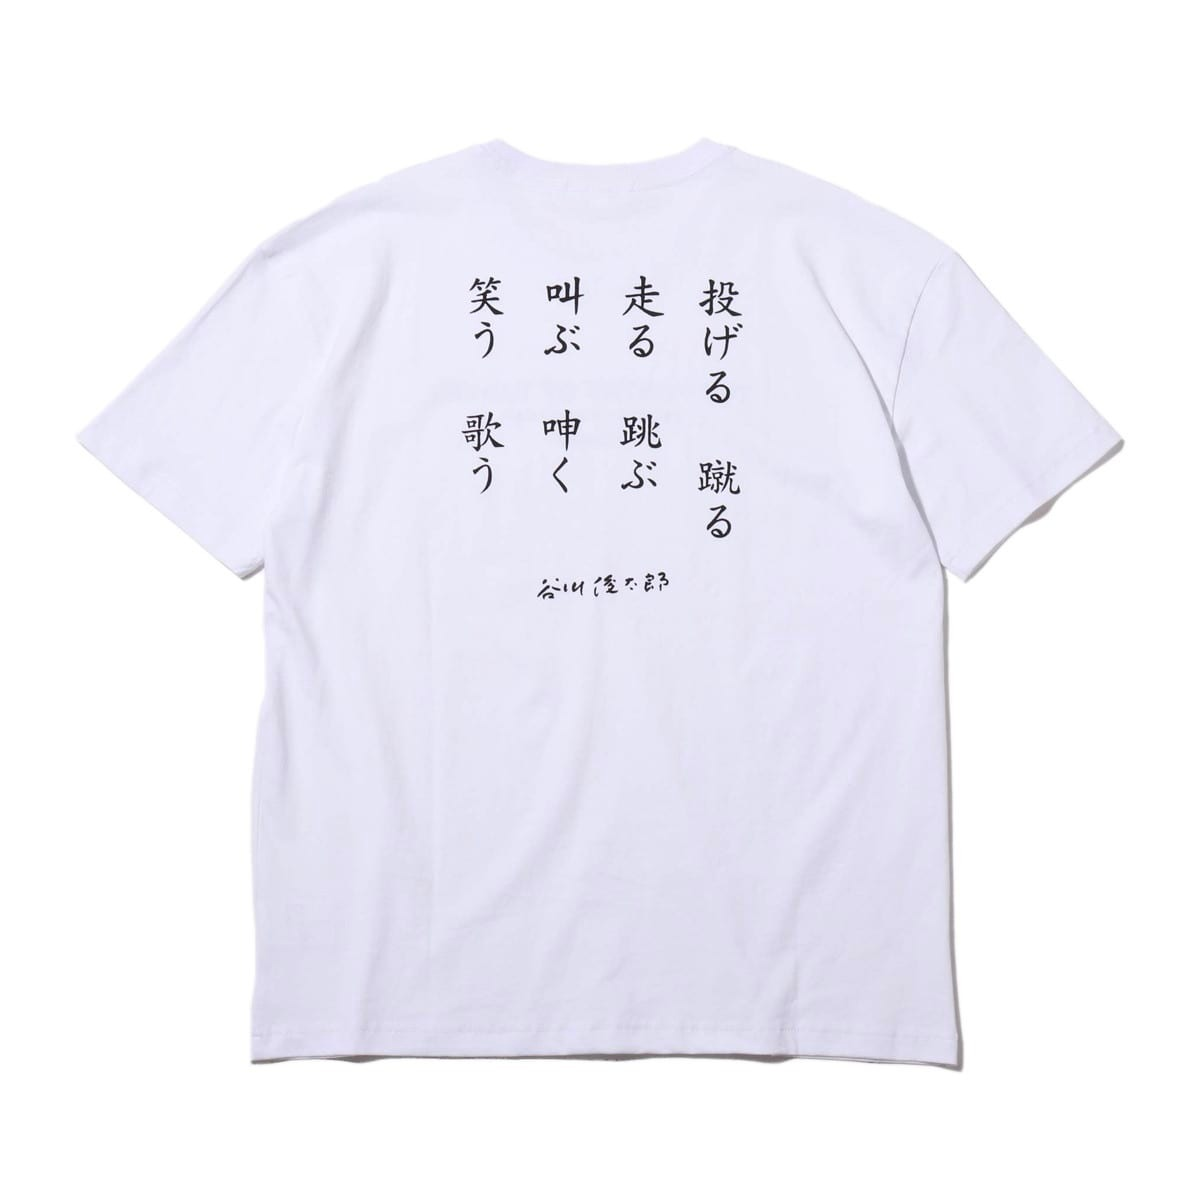 test ツイッターメディア - 【最終日】アトモスが谷川俊太郎とコラボ、詩をプリントしたTシャツを販売 https://t.co/kL4kNr2OIF https://t.co/j8c2TLl0oT